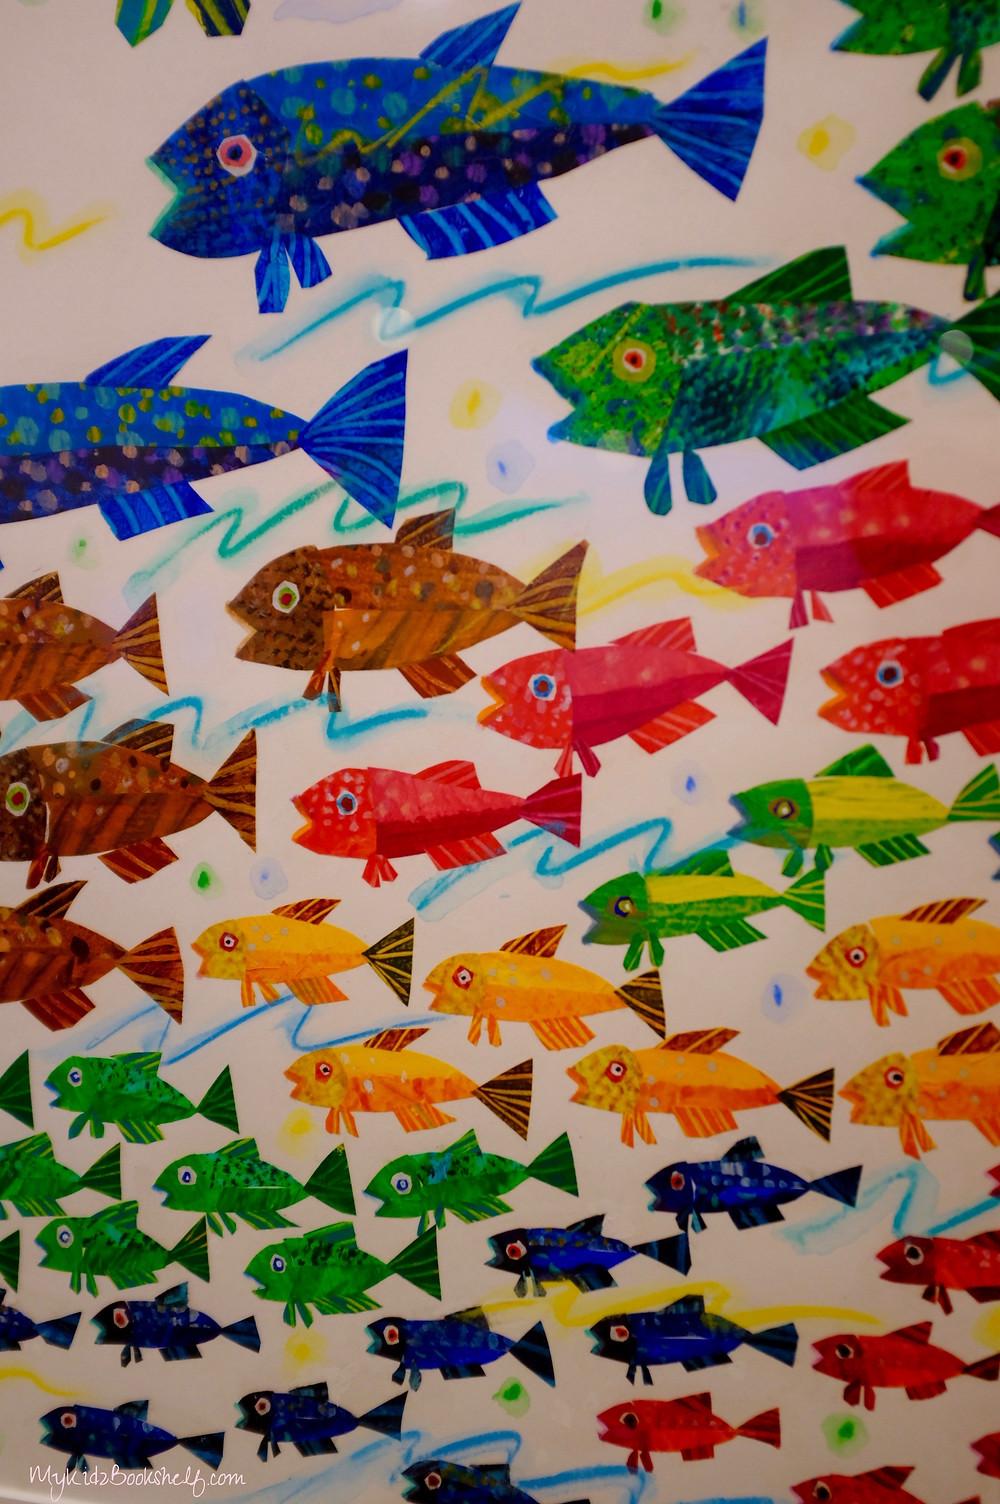 mural of fish at Eric Carle Museum of Picture Book Art